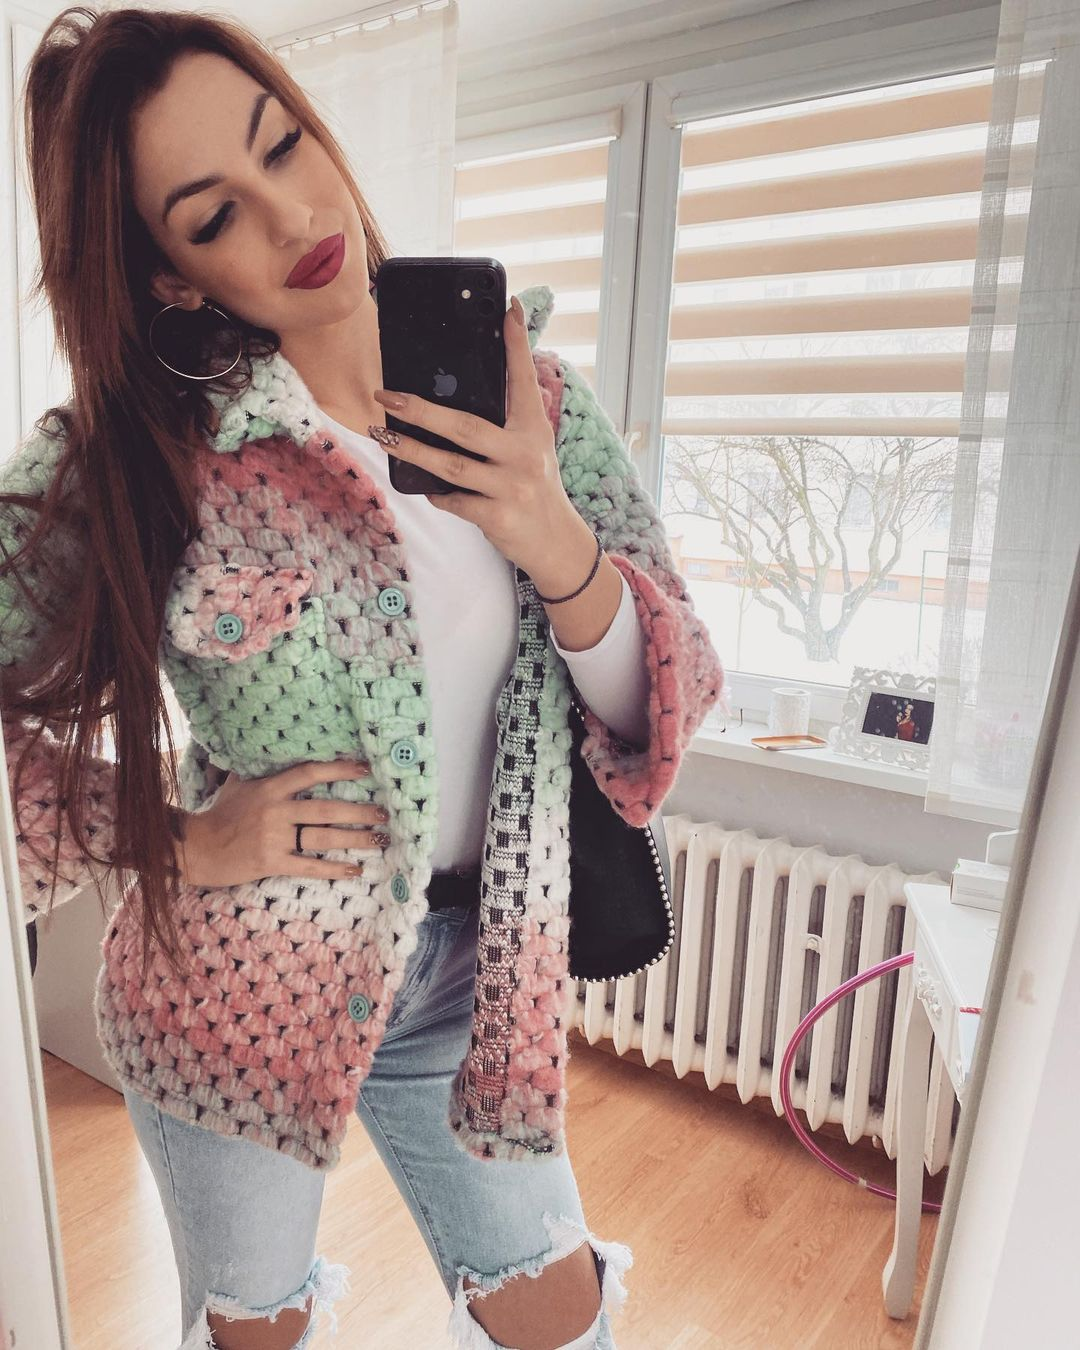 Adrianna-Gotowicka-Wallpapers-Insta-Fit-Bio-6